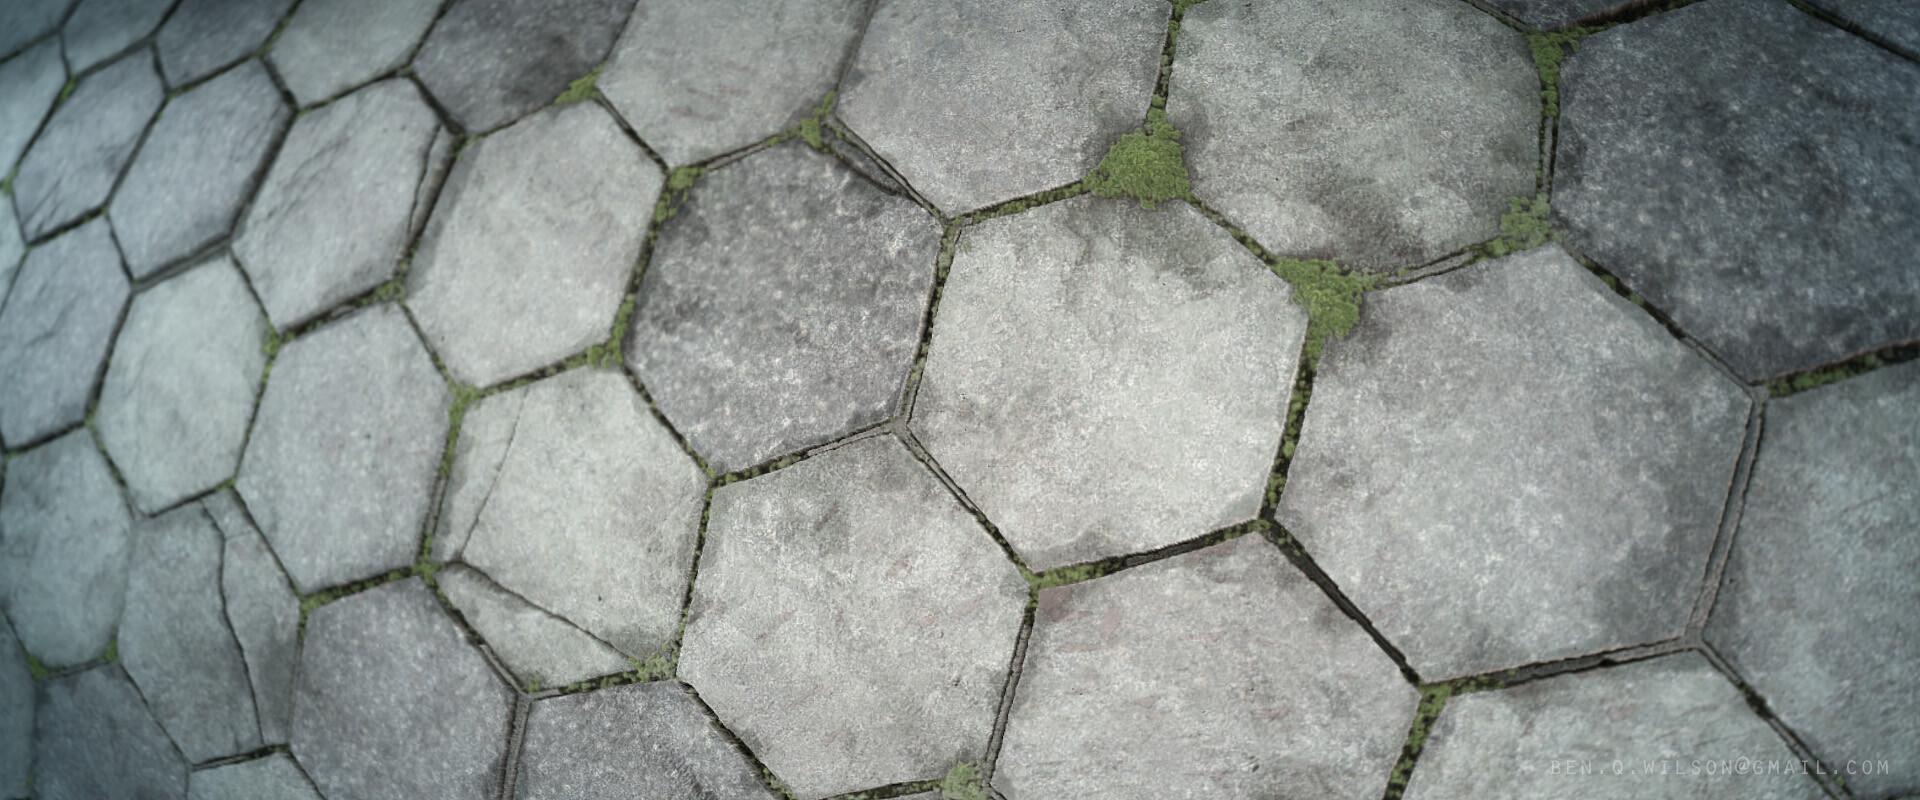 Ben wilson brick hex a render v2 2 1